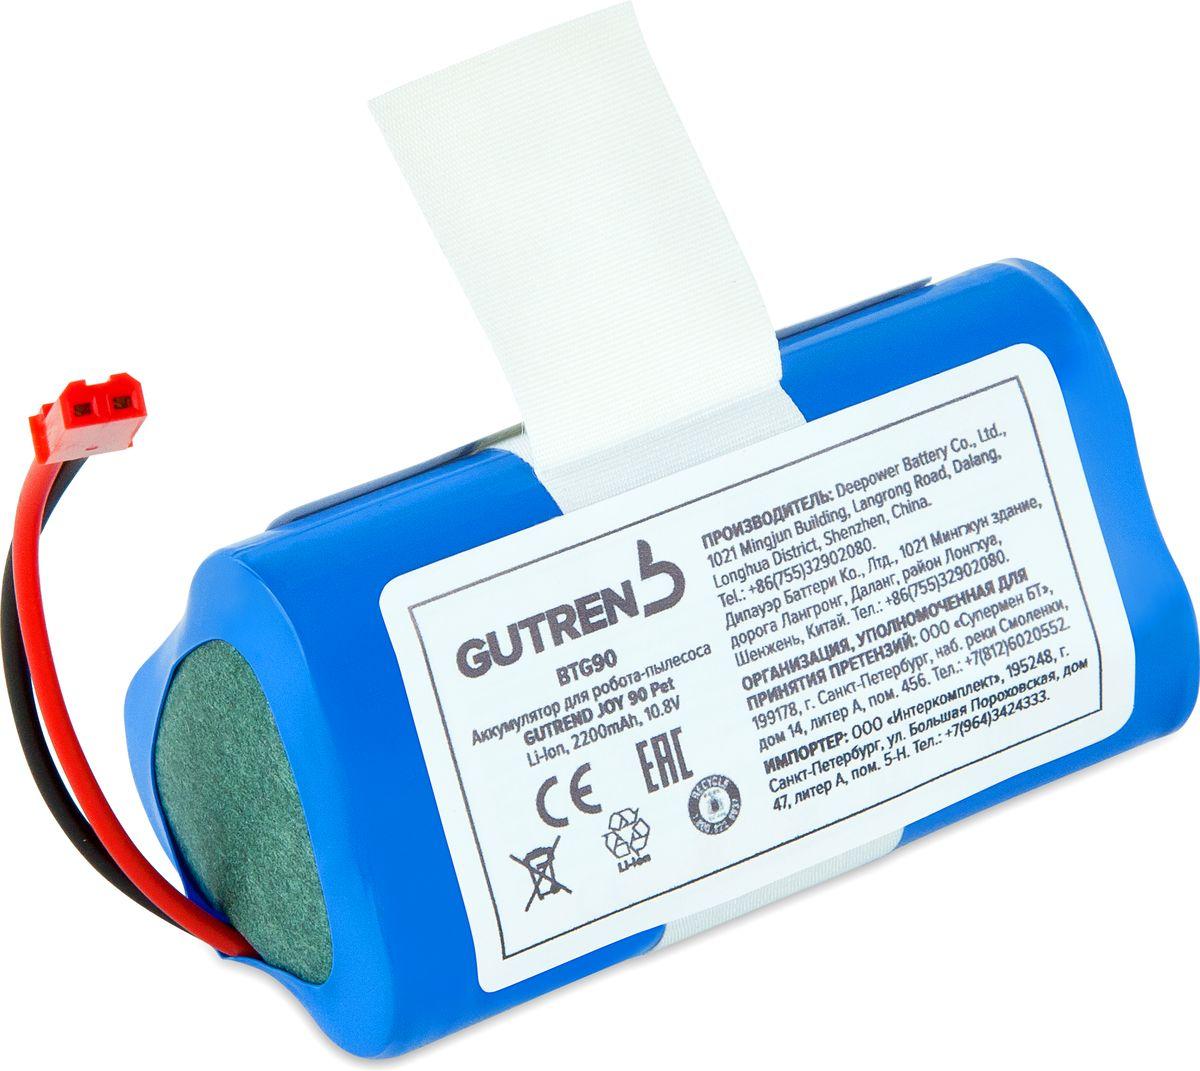 Gutrend BTG90 аккумуляторная батарея для Joy 90 Pet батарея аккумуляторная csb gp1272 f2